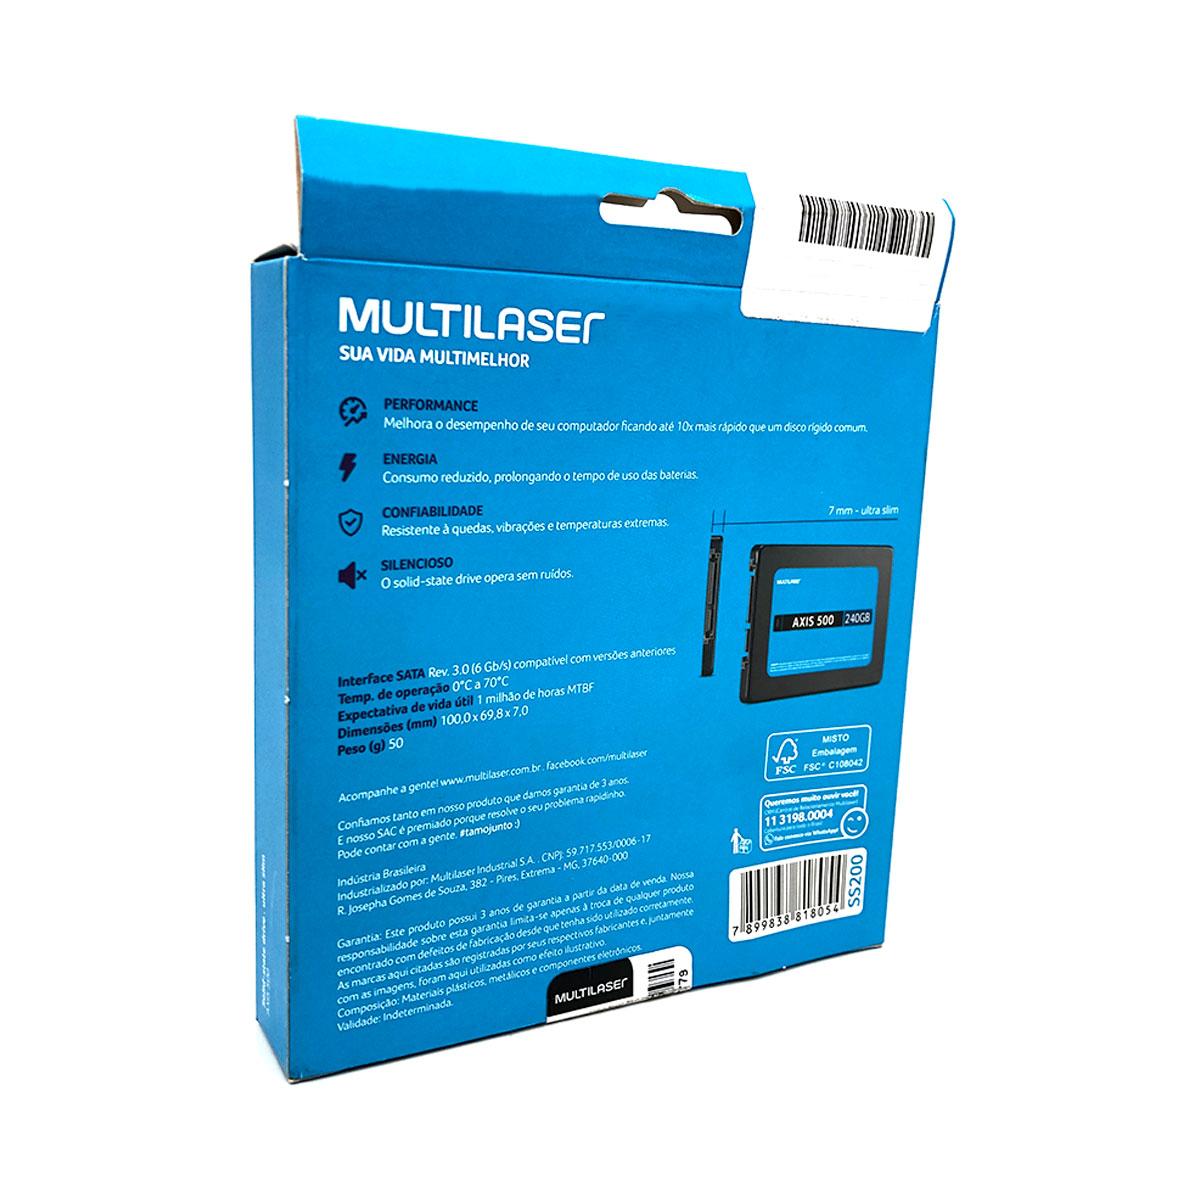 "HD SSD 240GB Multilaser Axis 500 SS200, Leitura 500MB/s, Gravação 500MB/s, 2,5"", SATA III 6 GB/s"